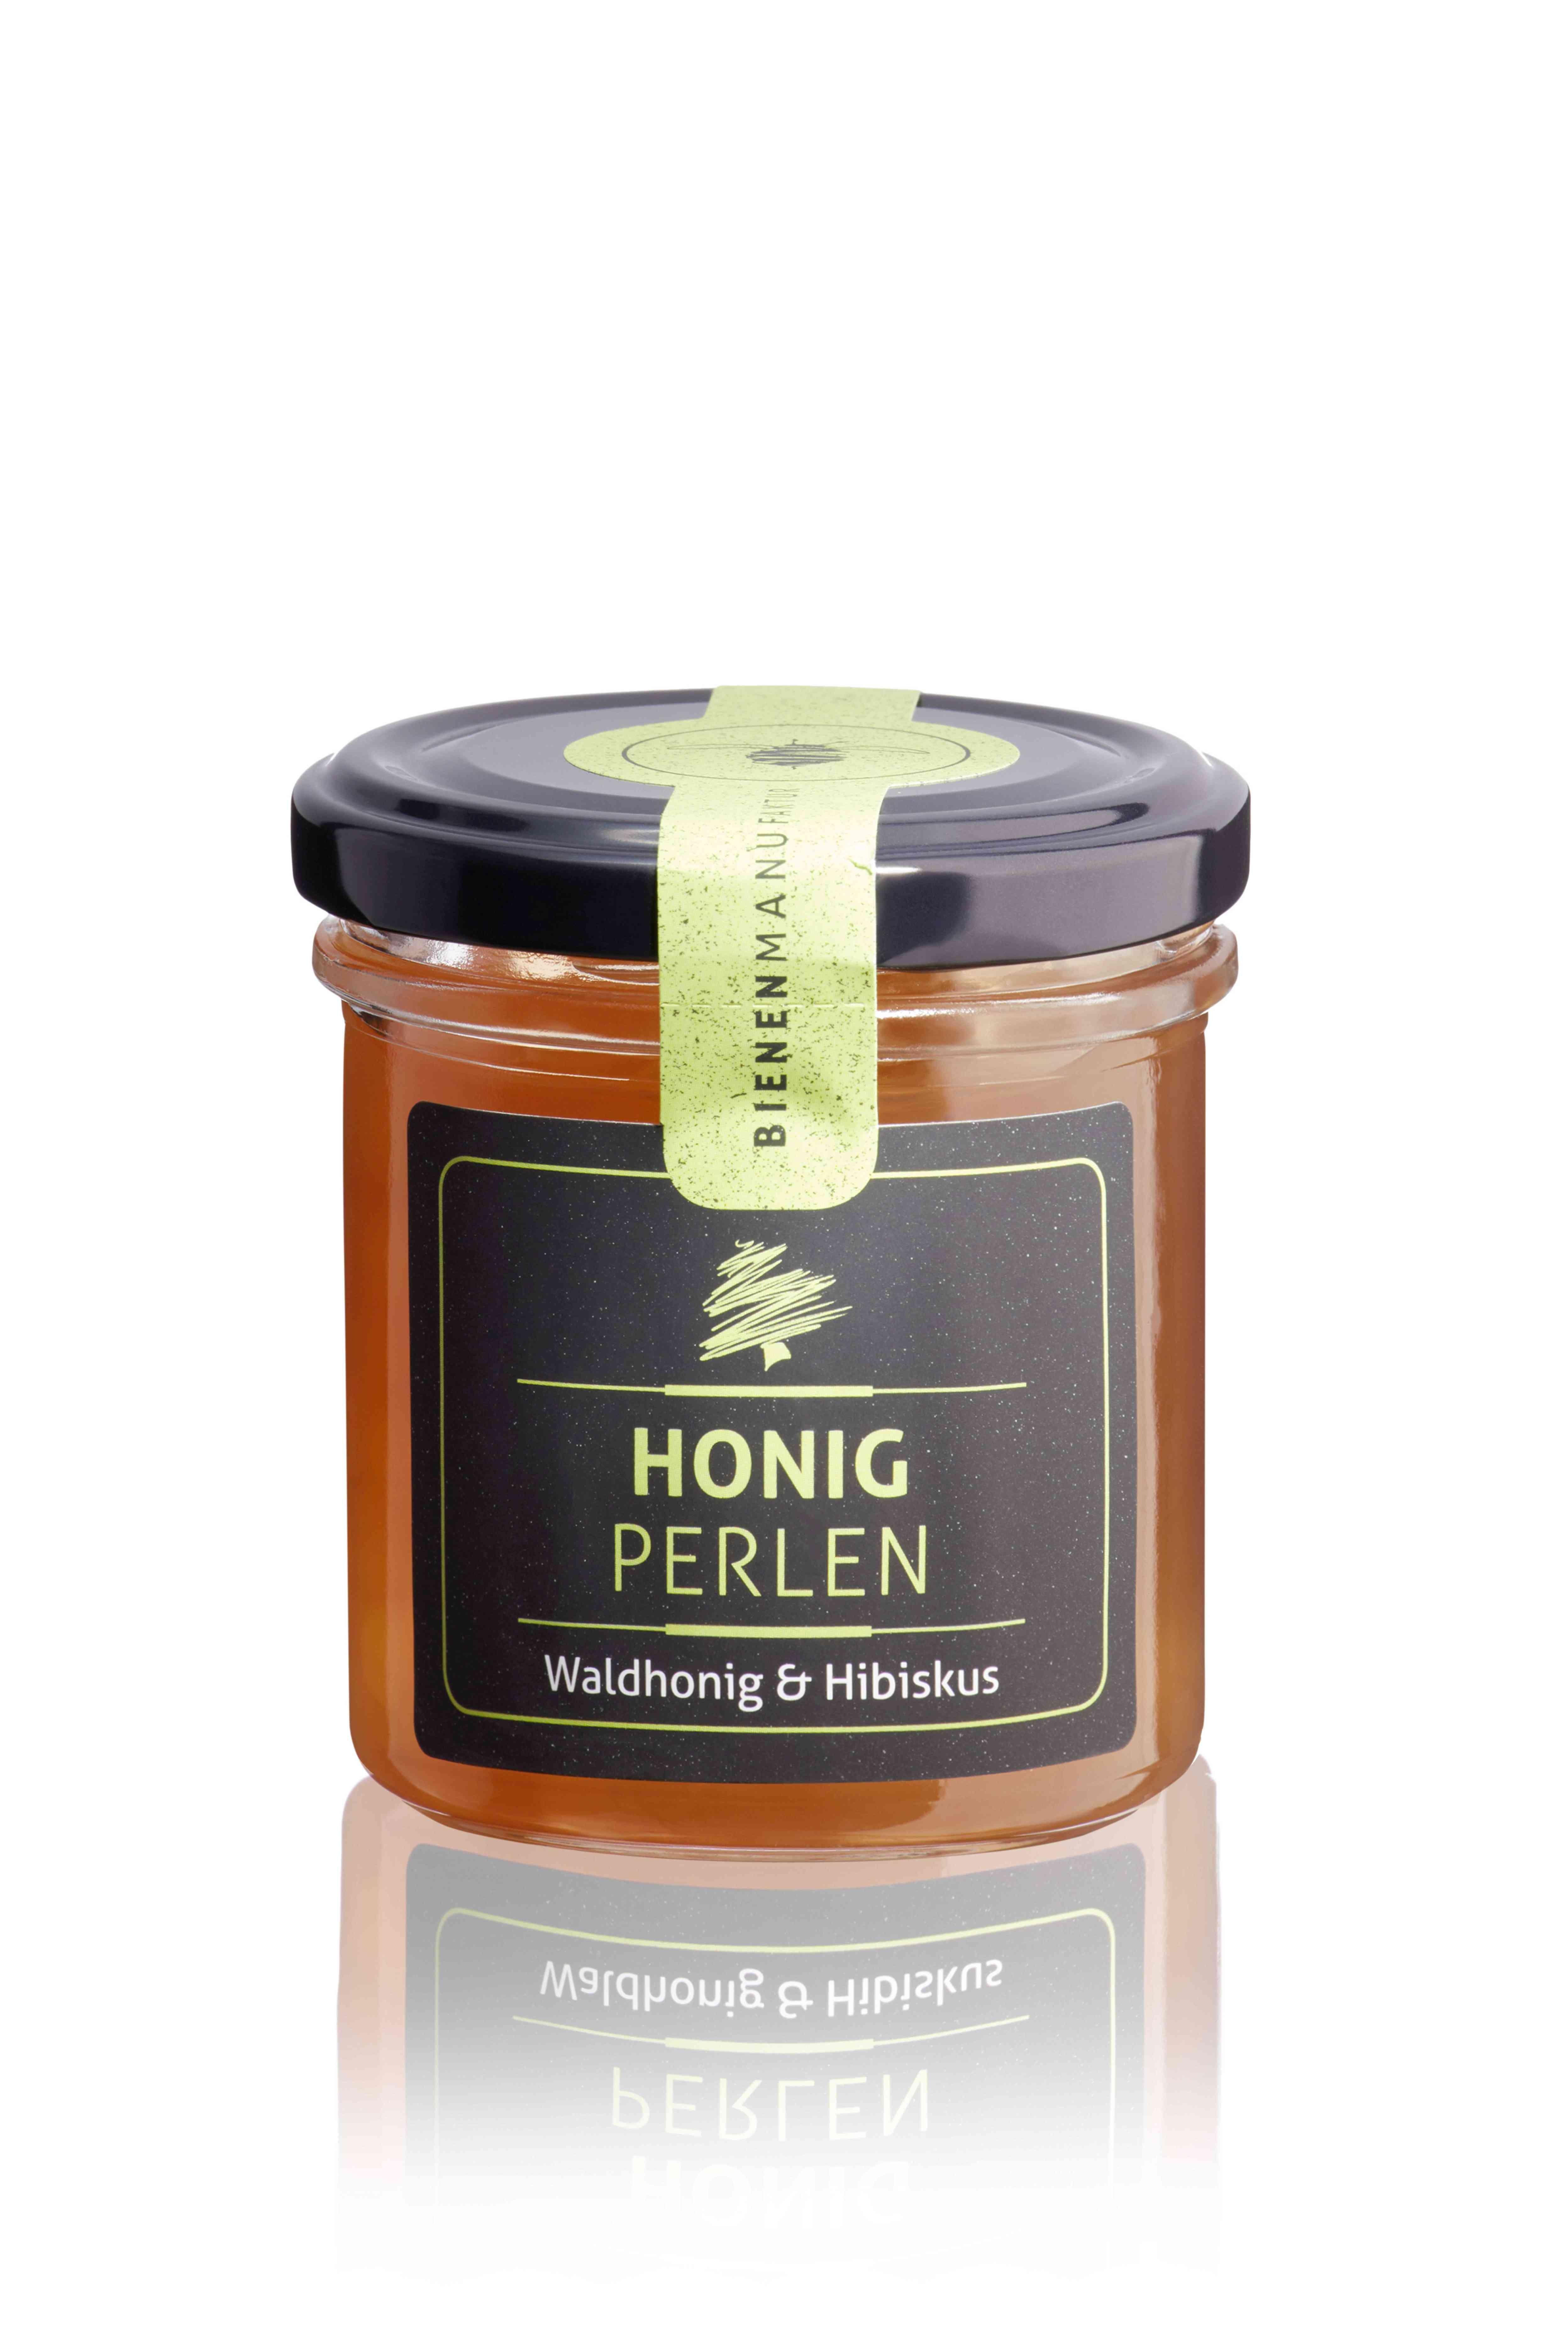 Honigperlen Waldhonig & Hibiskus 150g